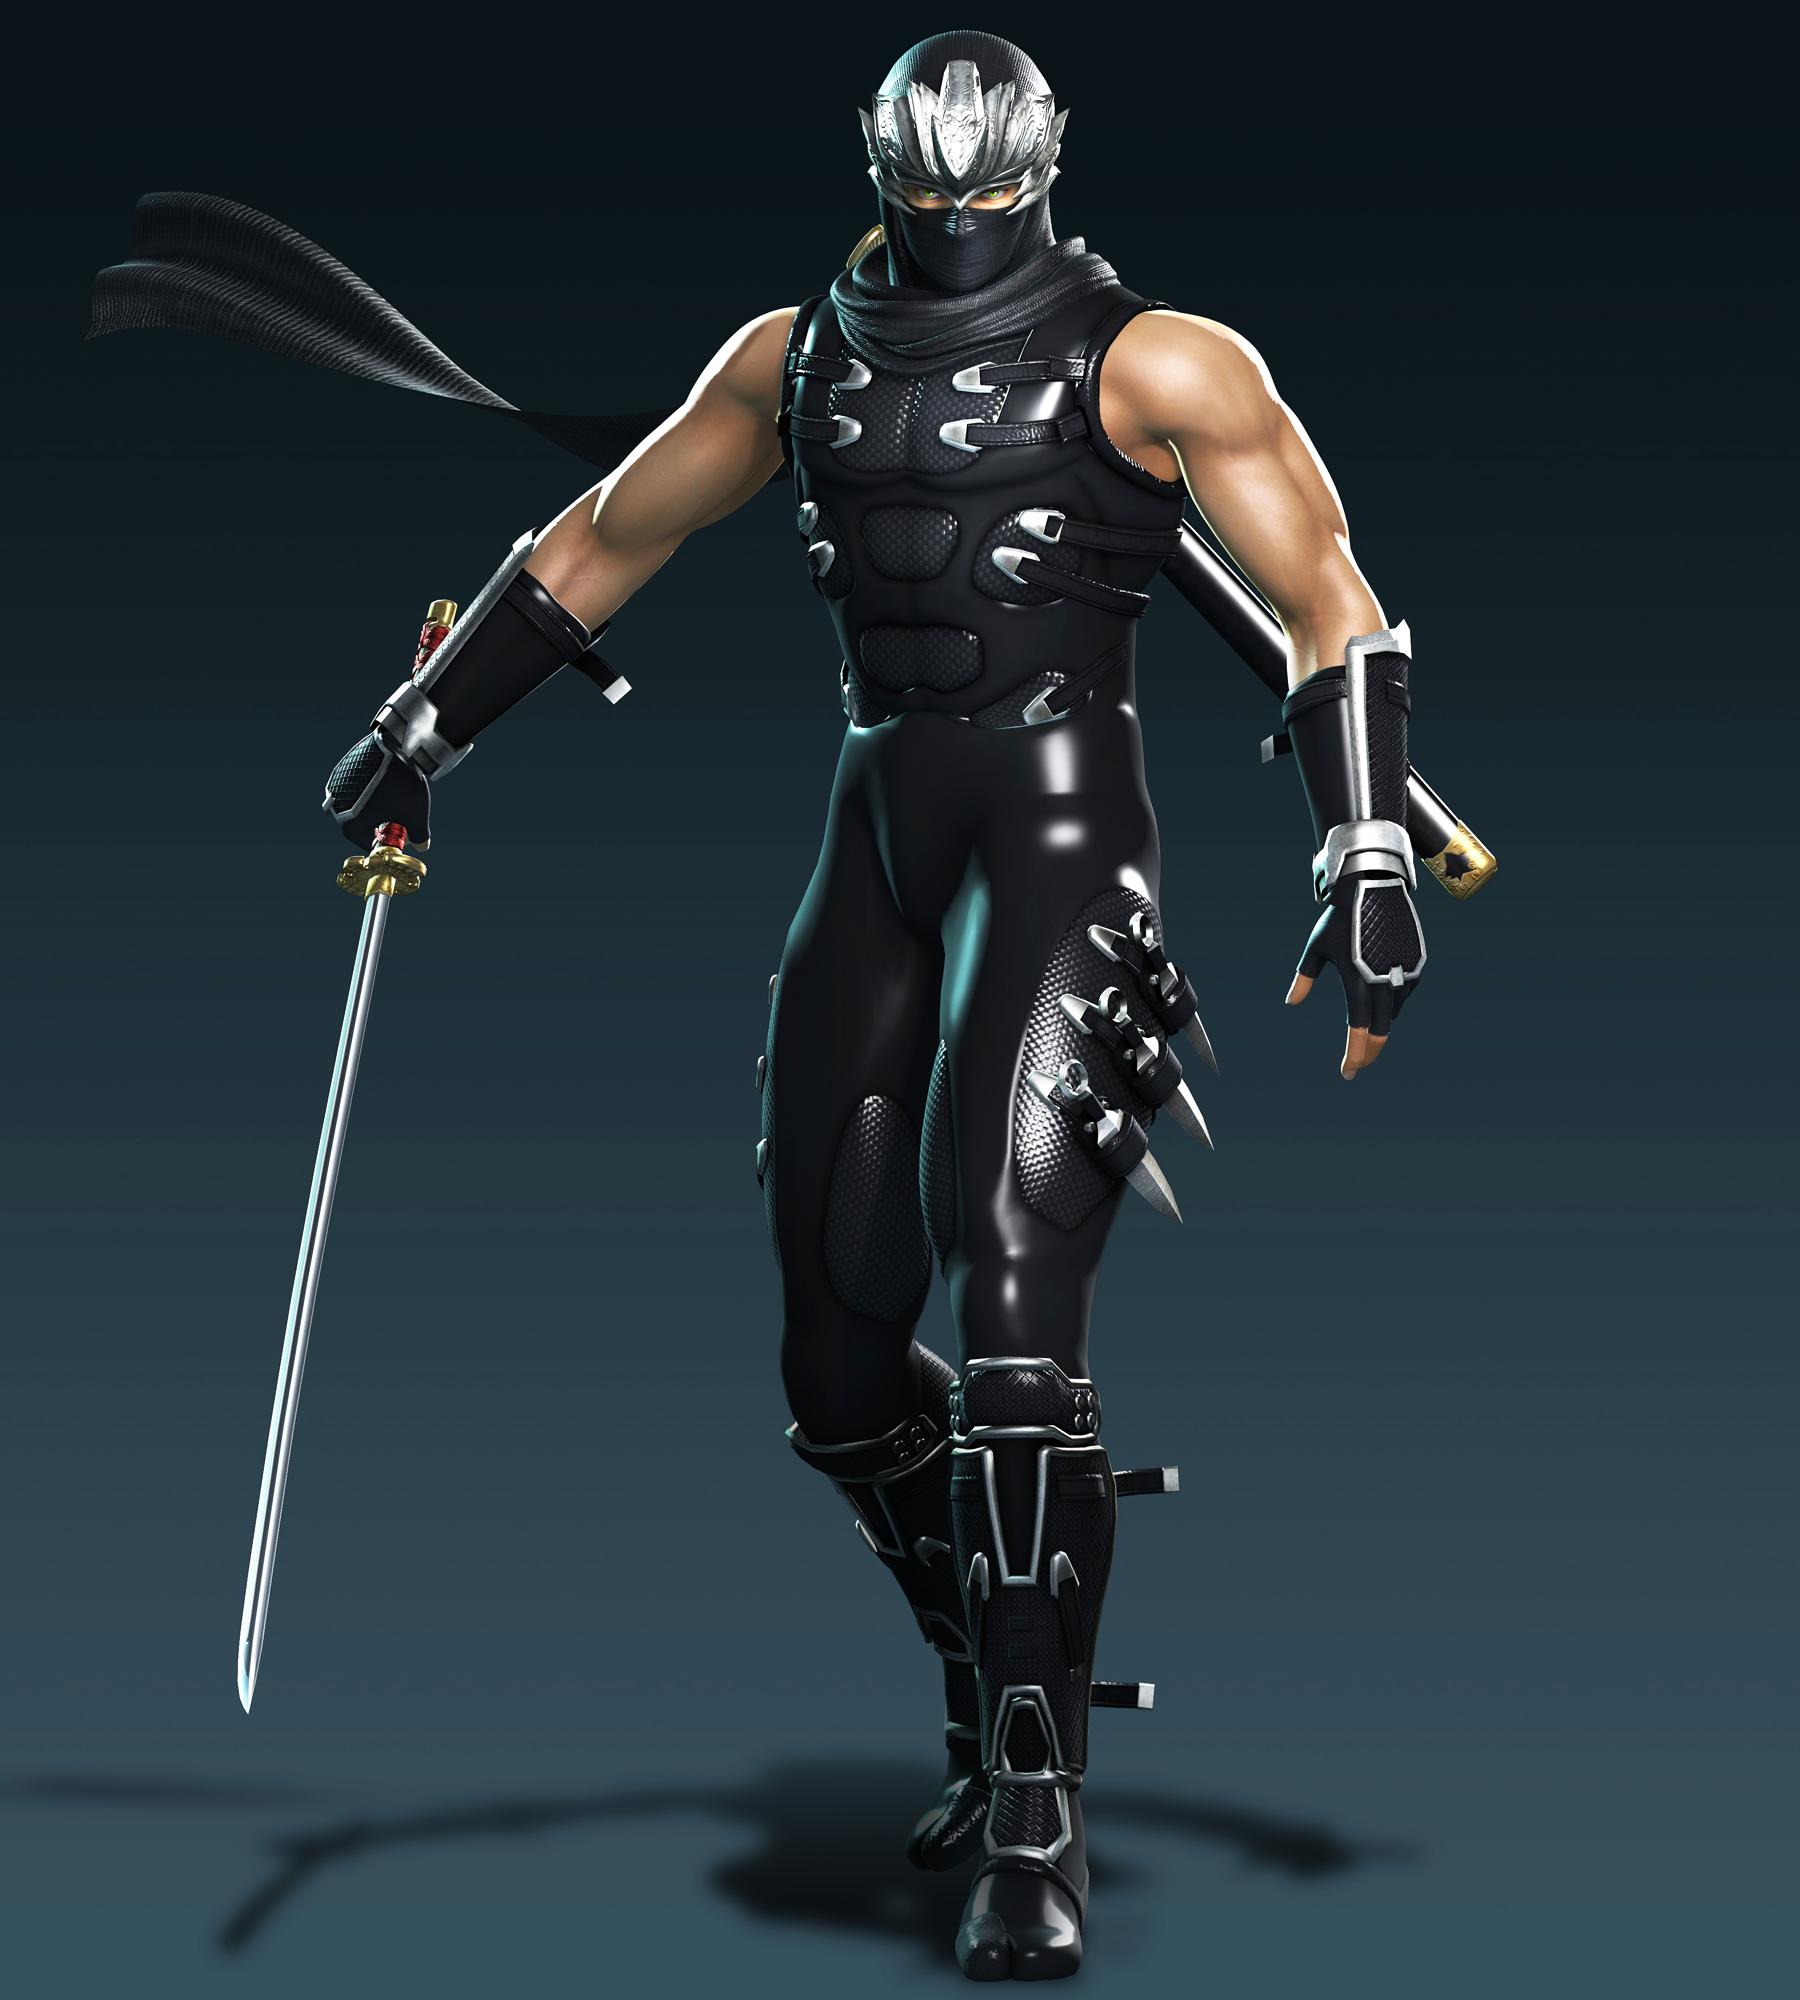 Warriors Orochi 3 Ultimate Ryu Hayabusa: Video Game Characters